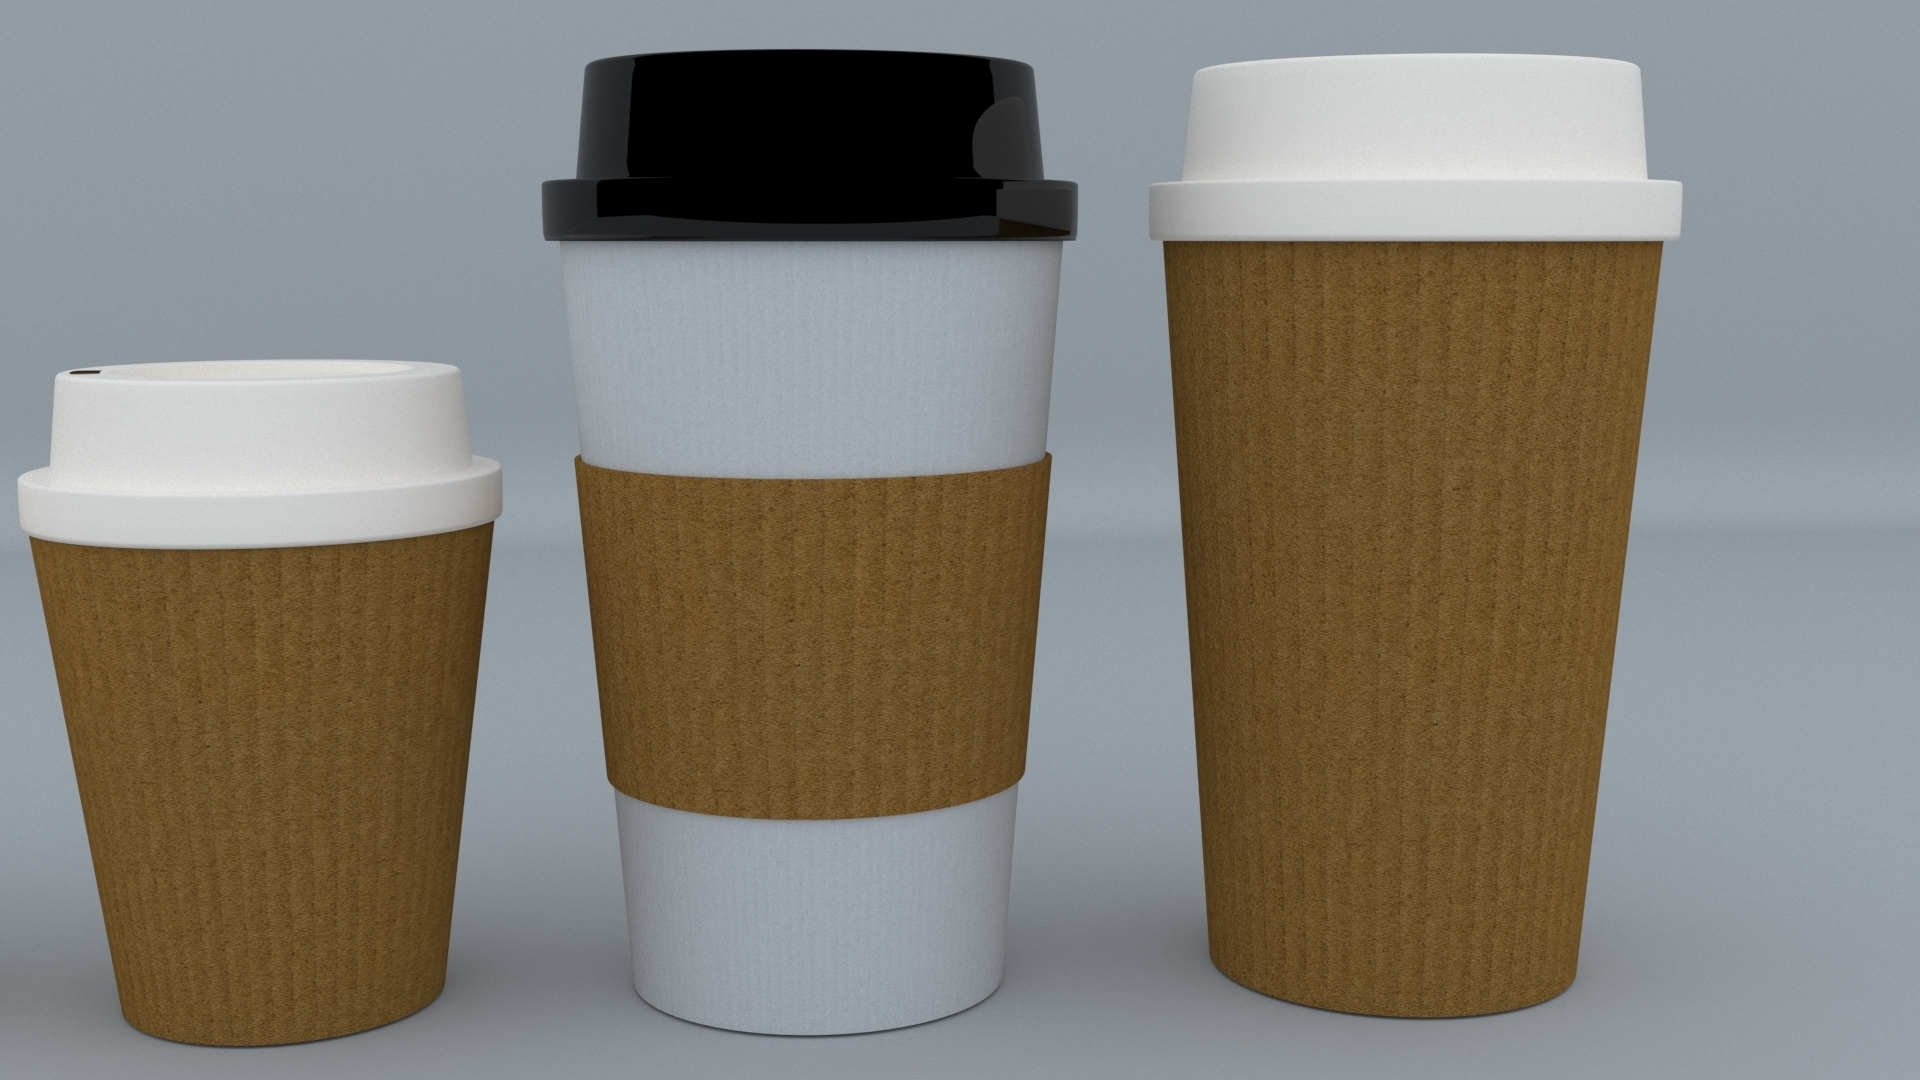 7.jpg Download STL file Coffee Cup • 3D printing template, illusioncreators1979